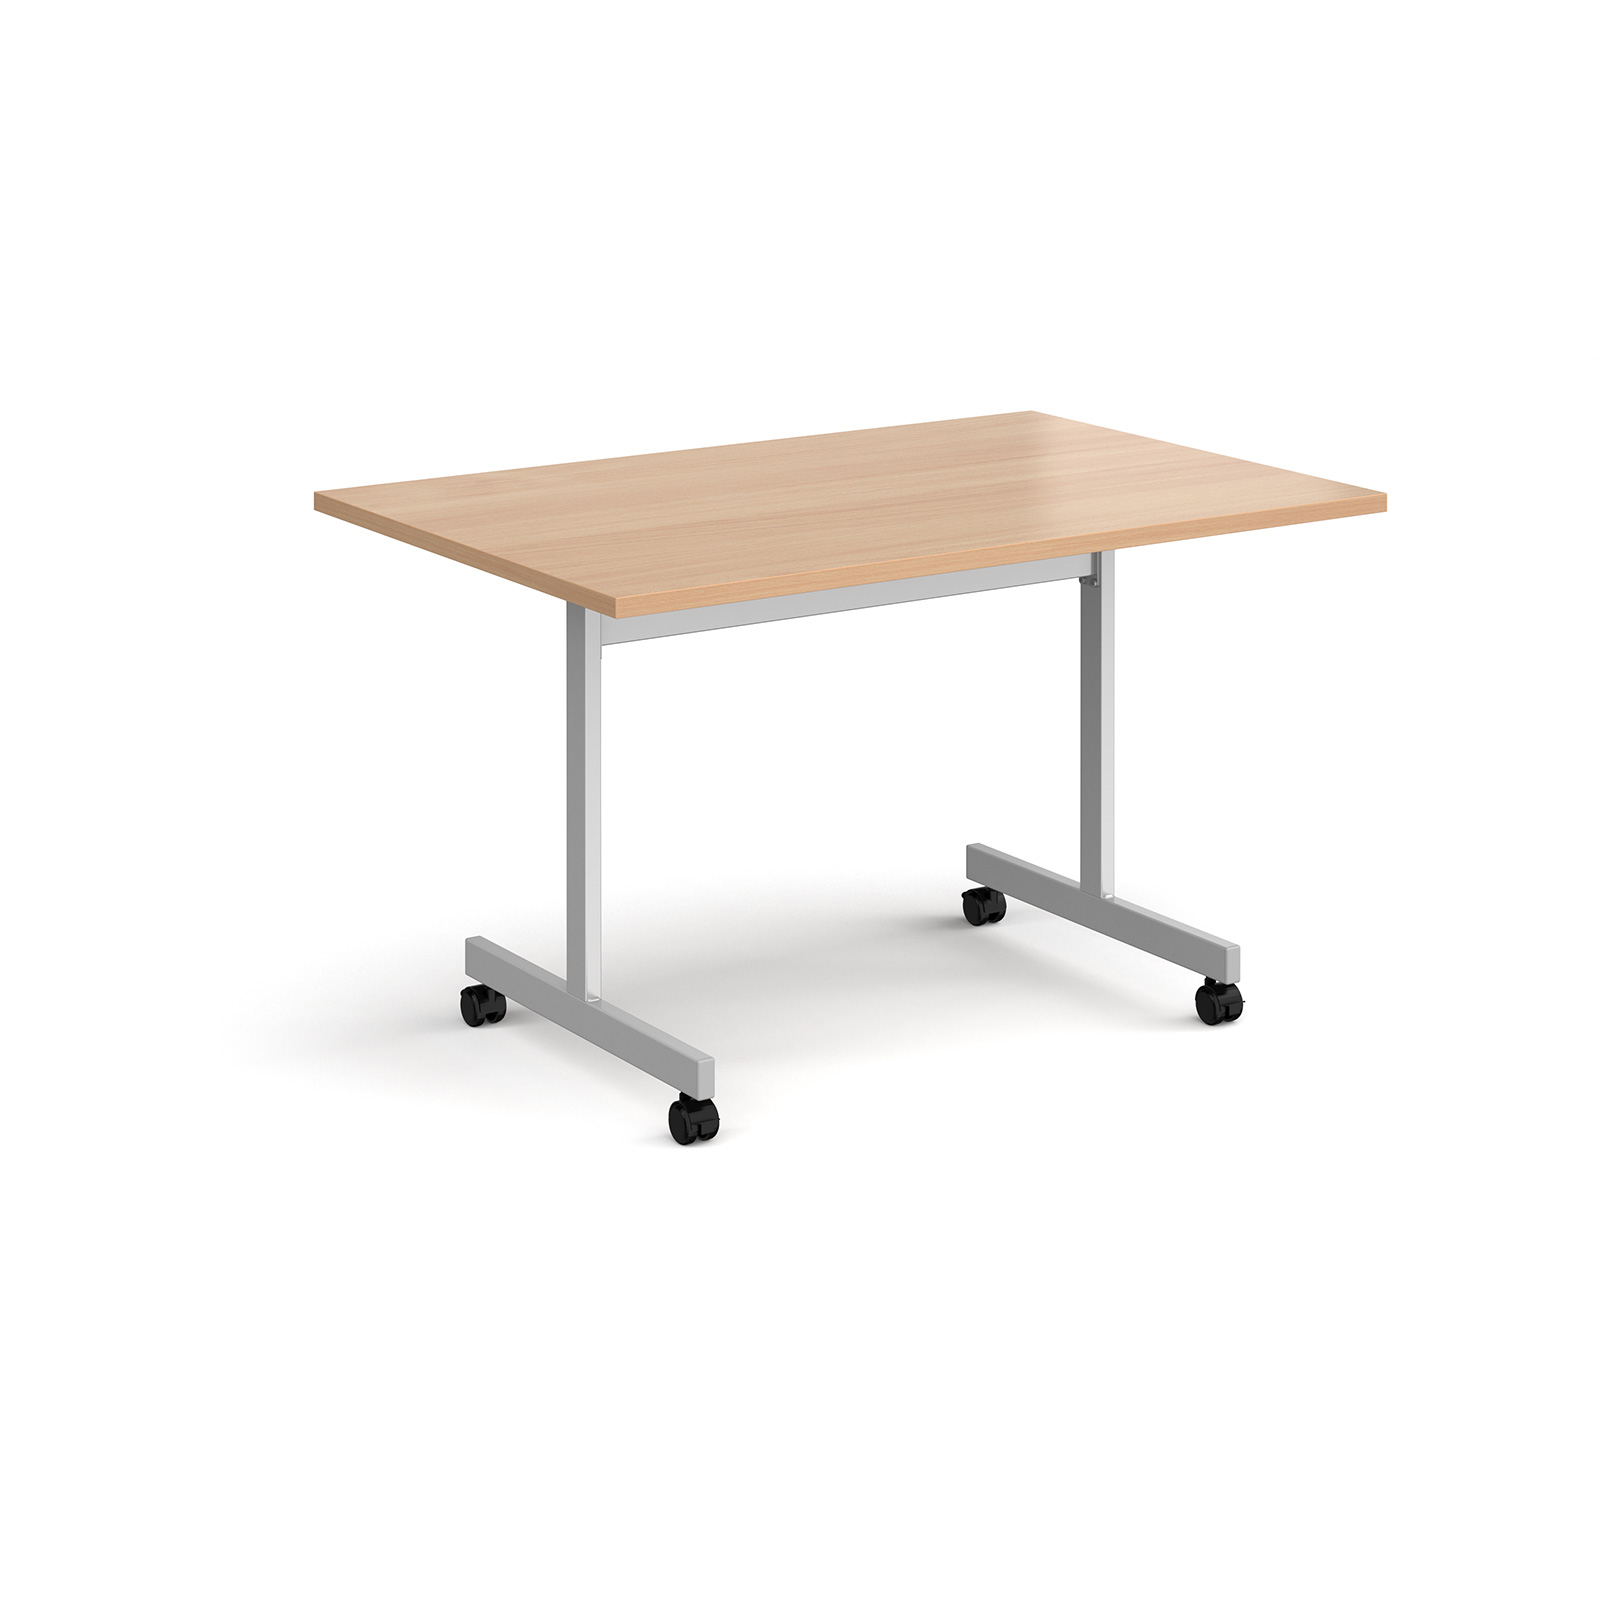 Rectangular fliptop meeting table